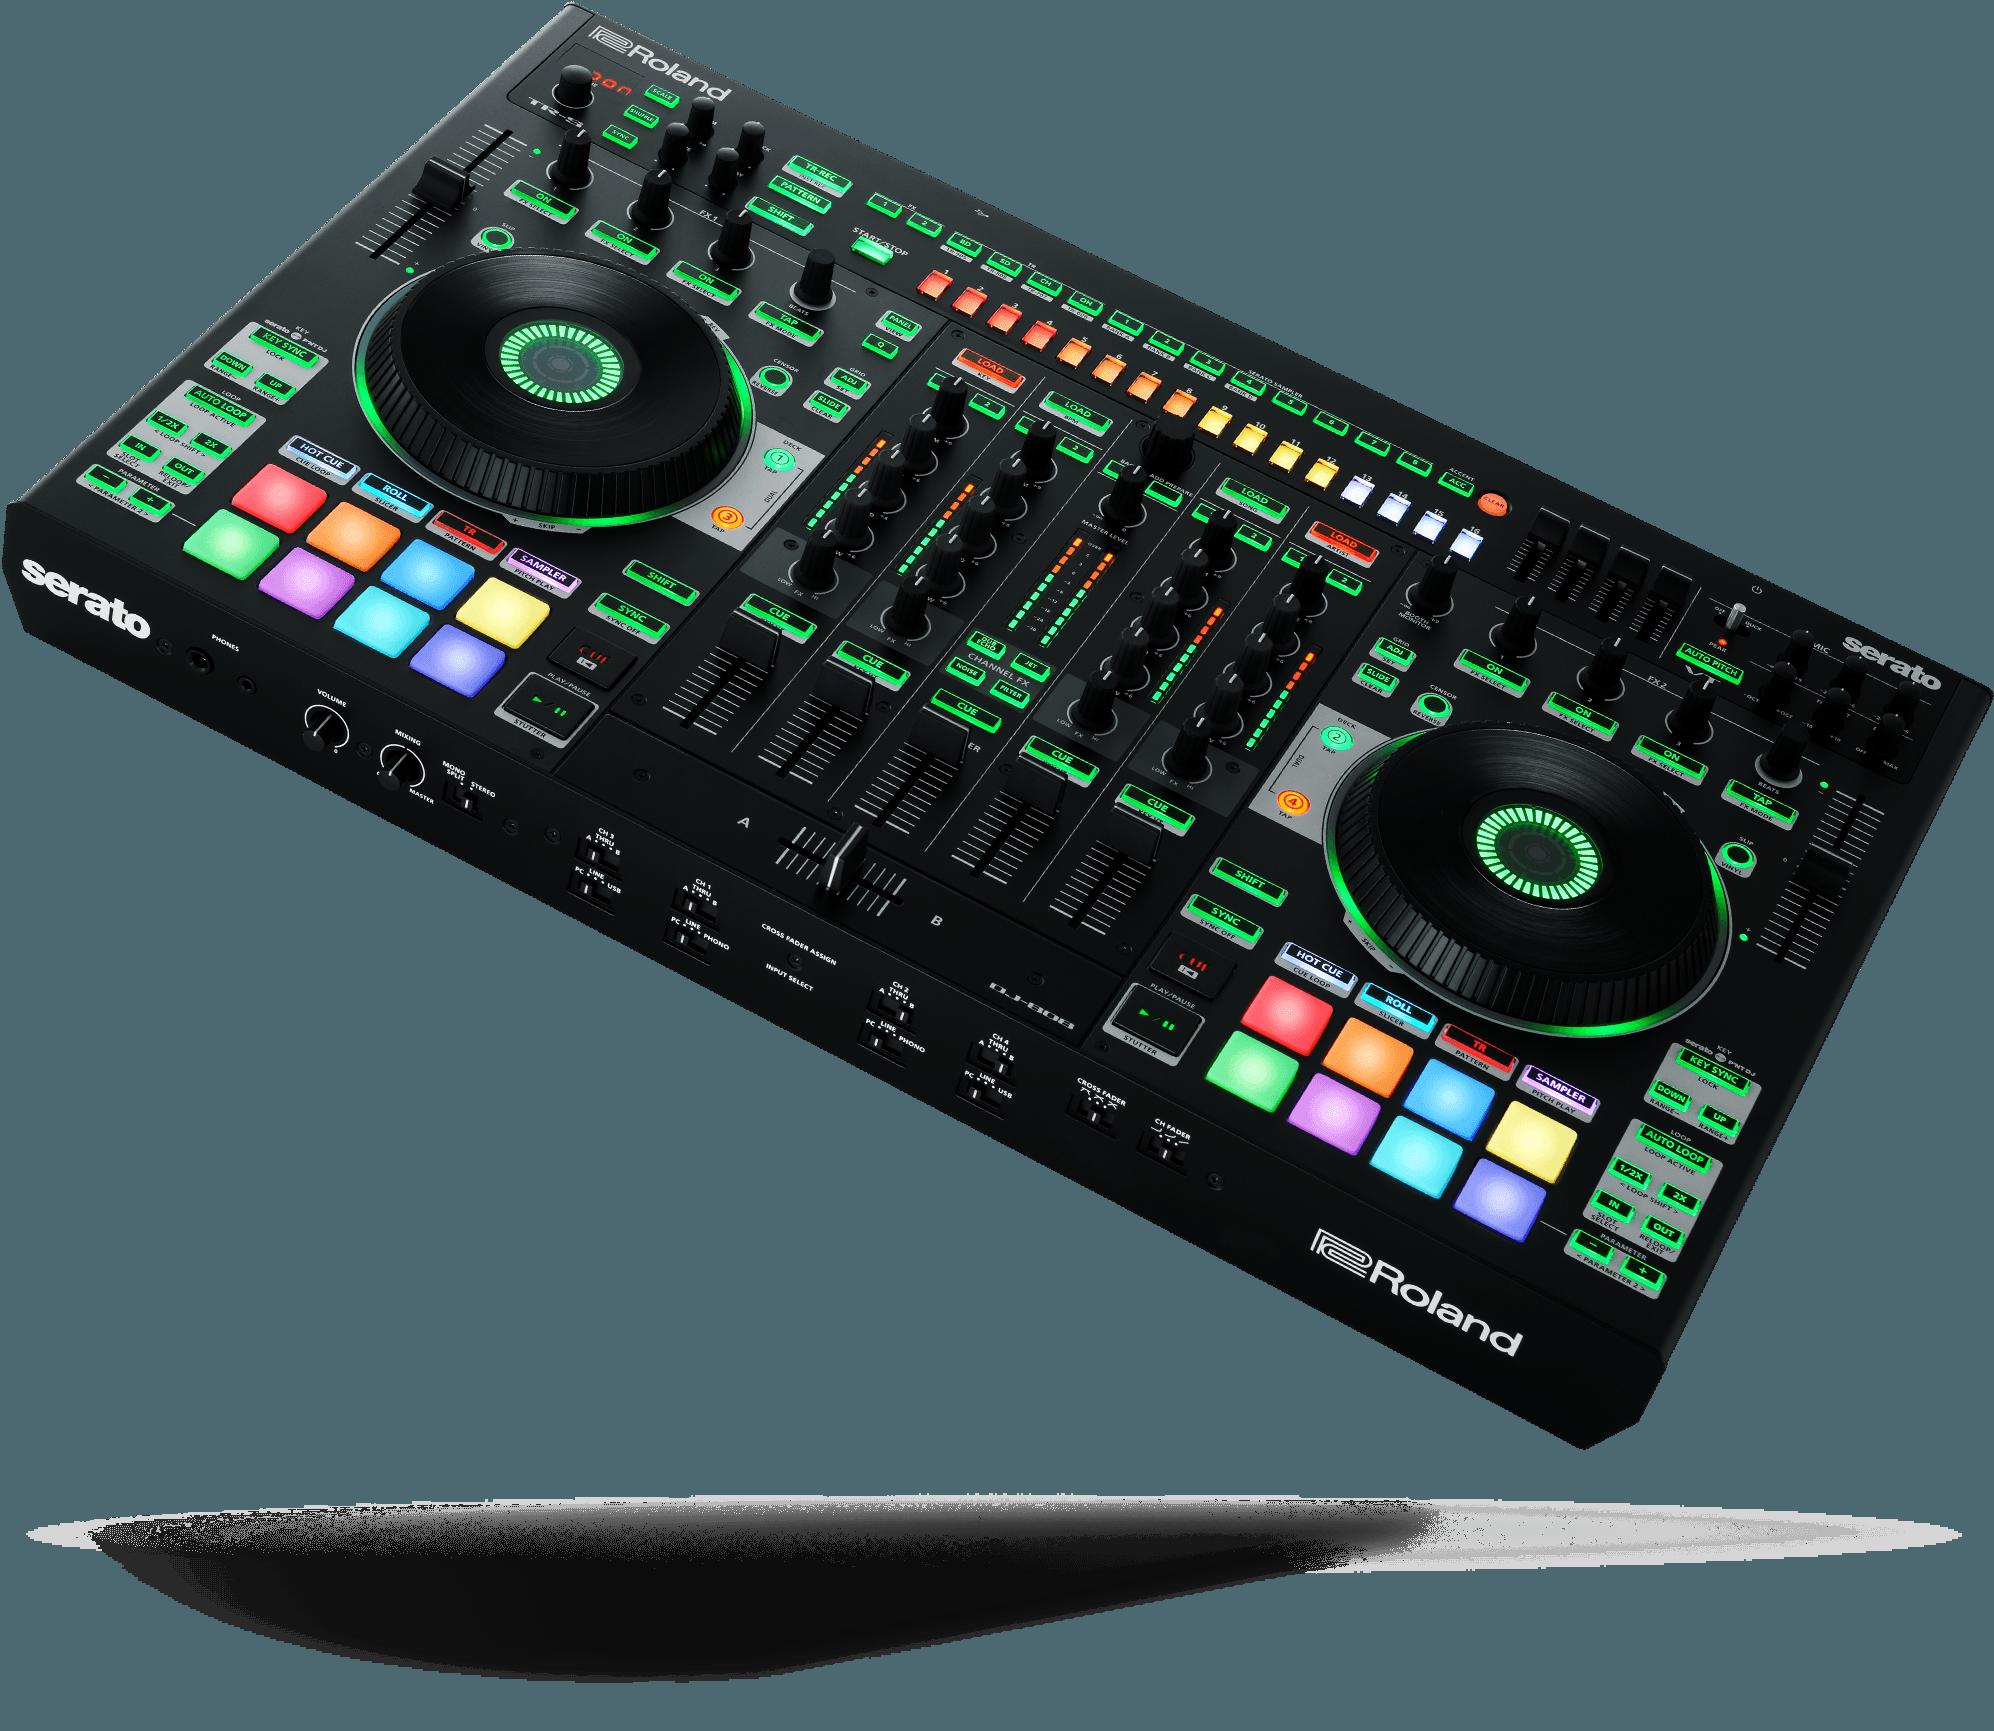 Serato DJ Pro and the Roland DJ-808 | Serato.com